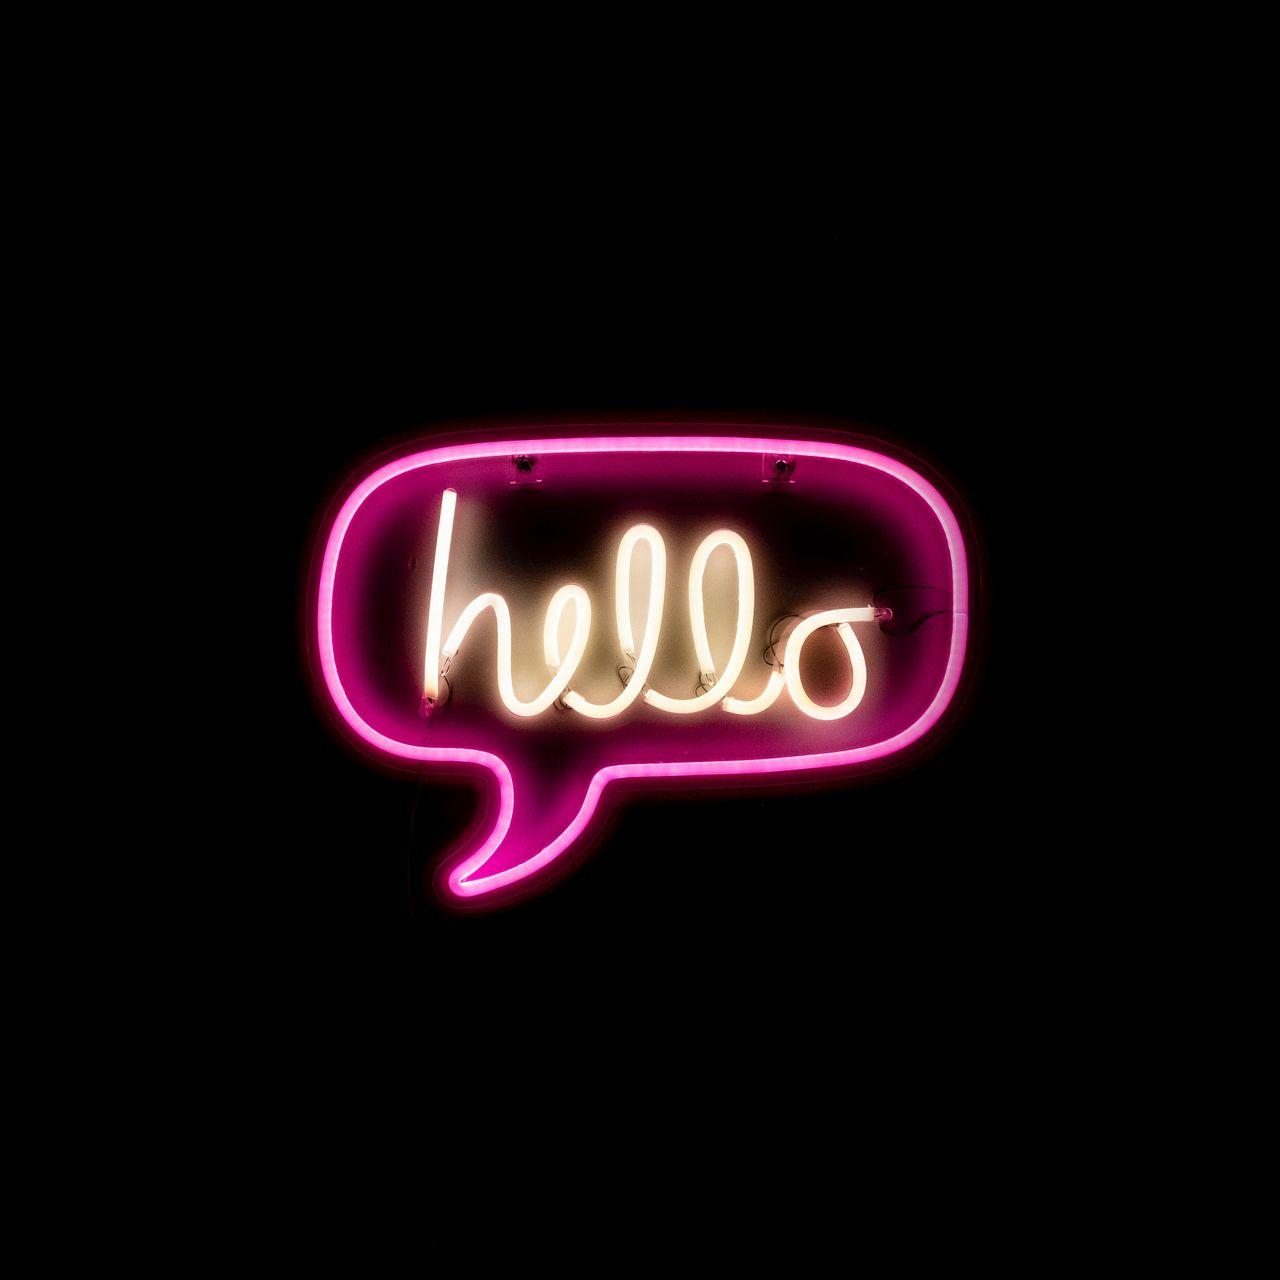 1280x1280 Wallpaper hello, neon, inscription, text